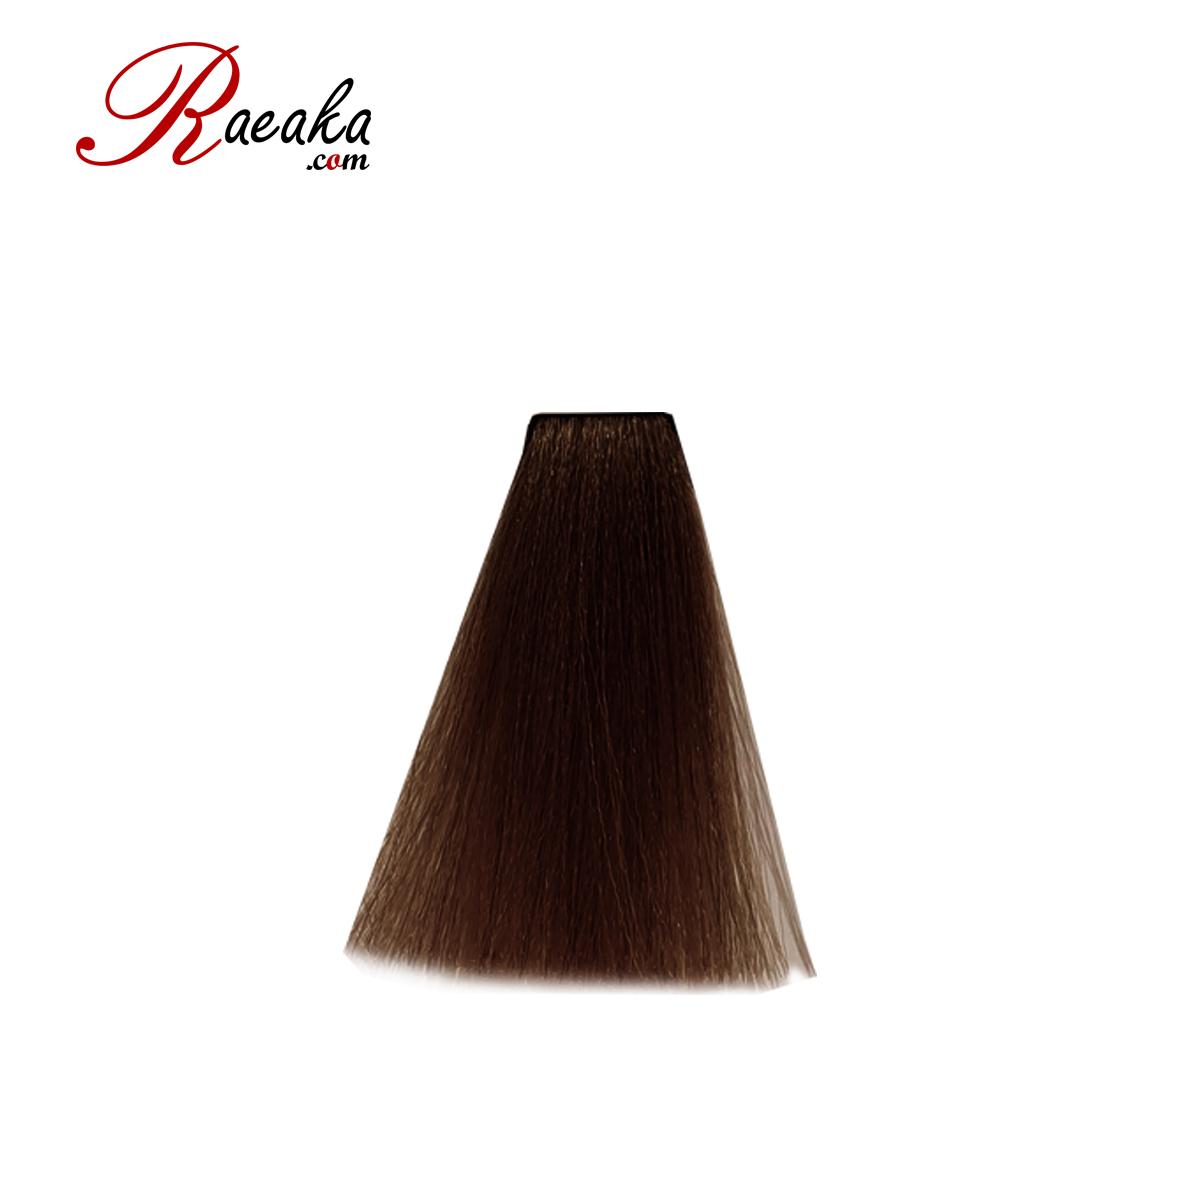 رنگ مو دوماسی سری فندقی قهوه ای فندقی تیره ۳٫۷۴ حجم ۱۲۰ میلی لیتر